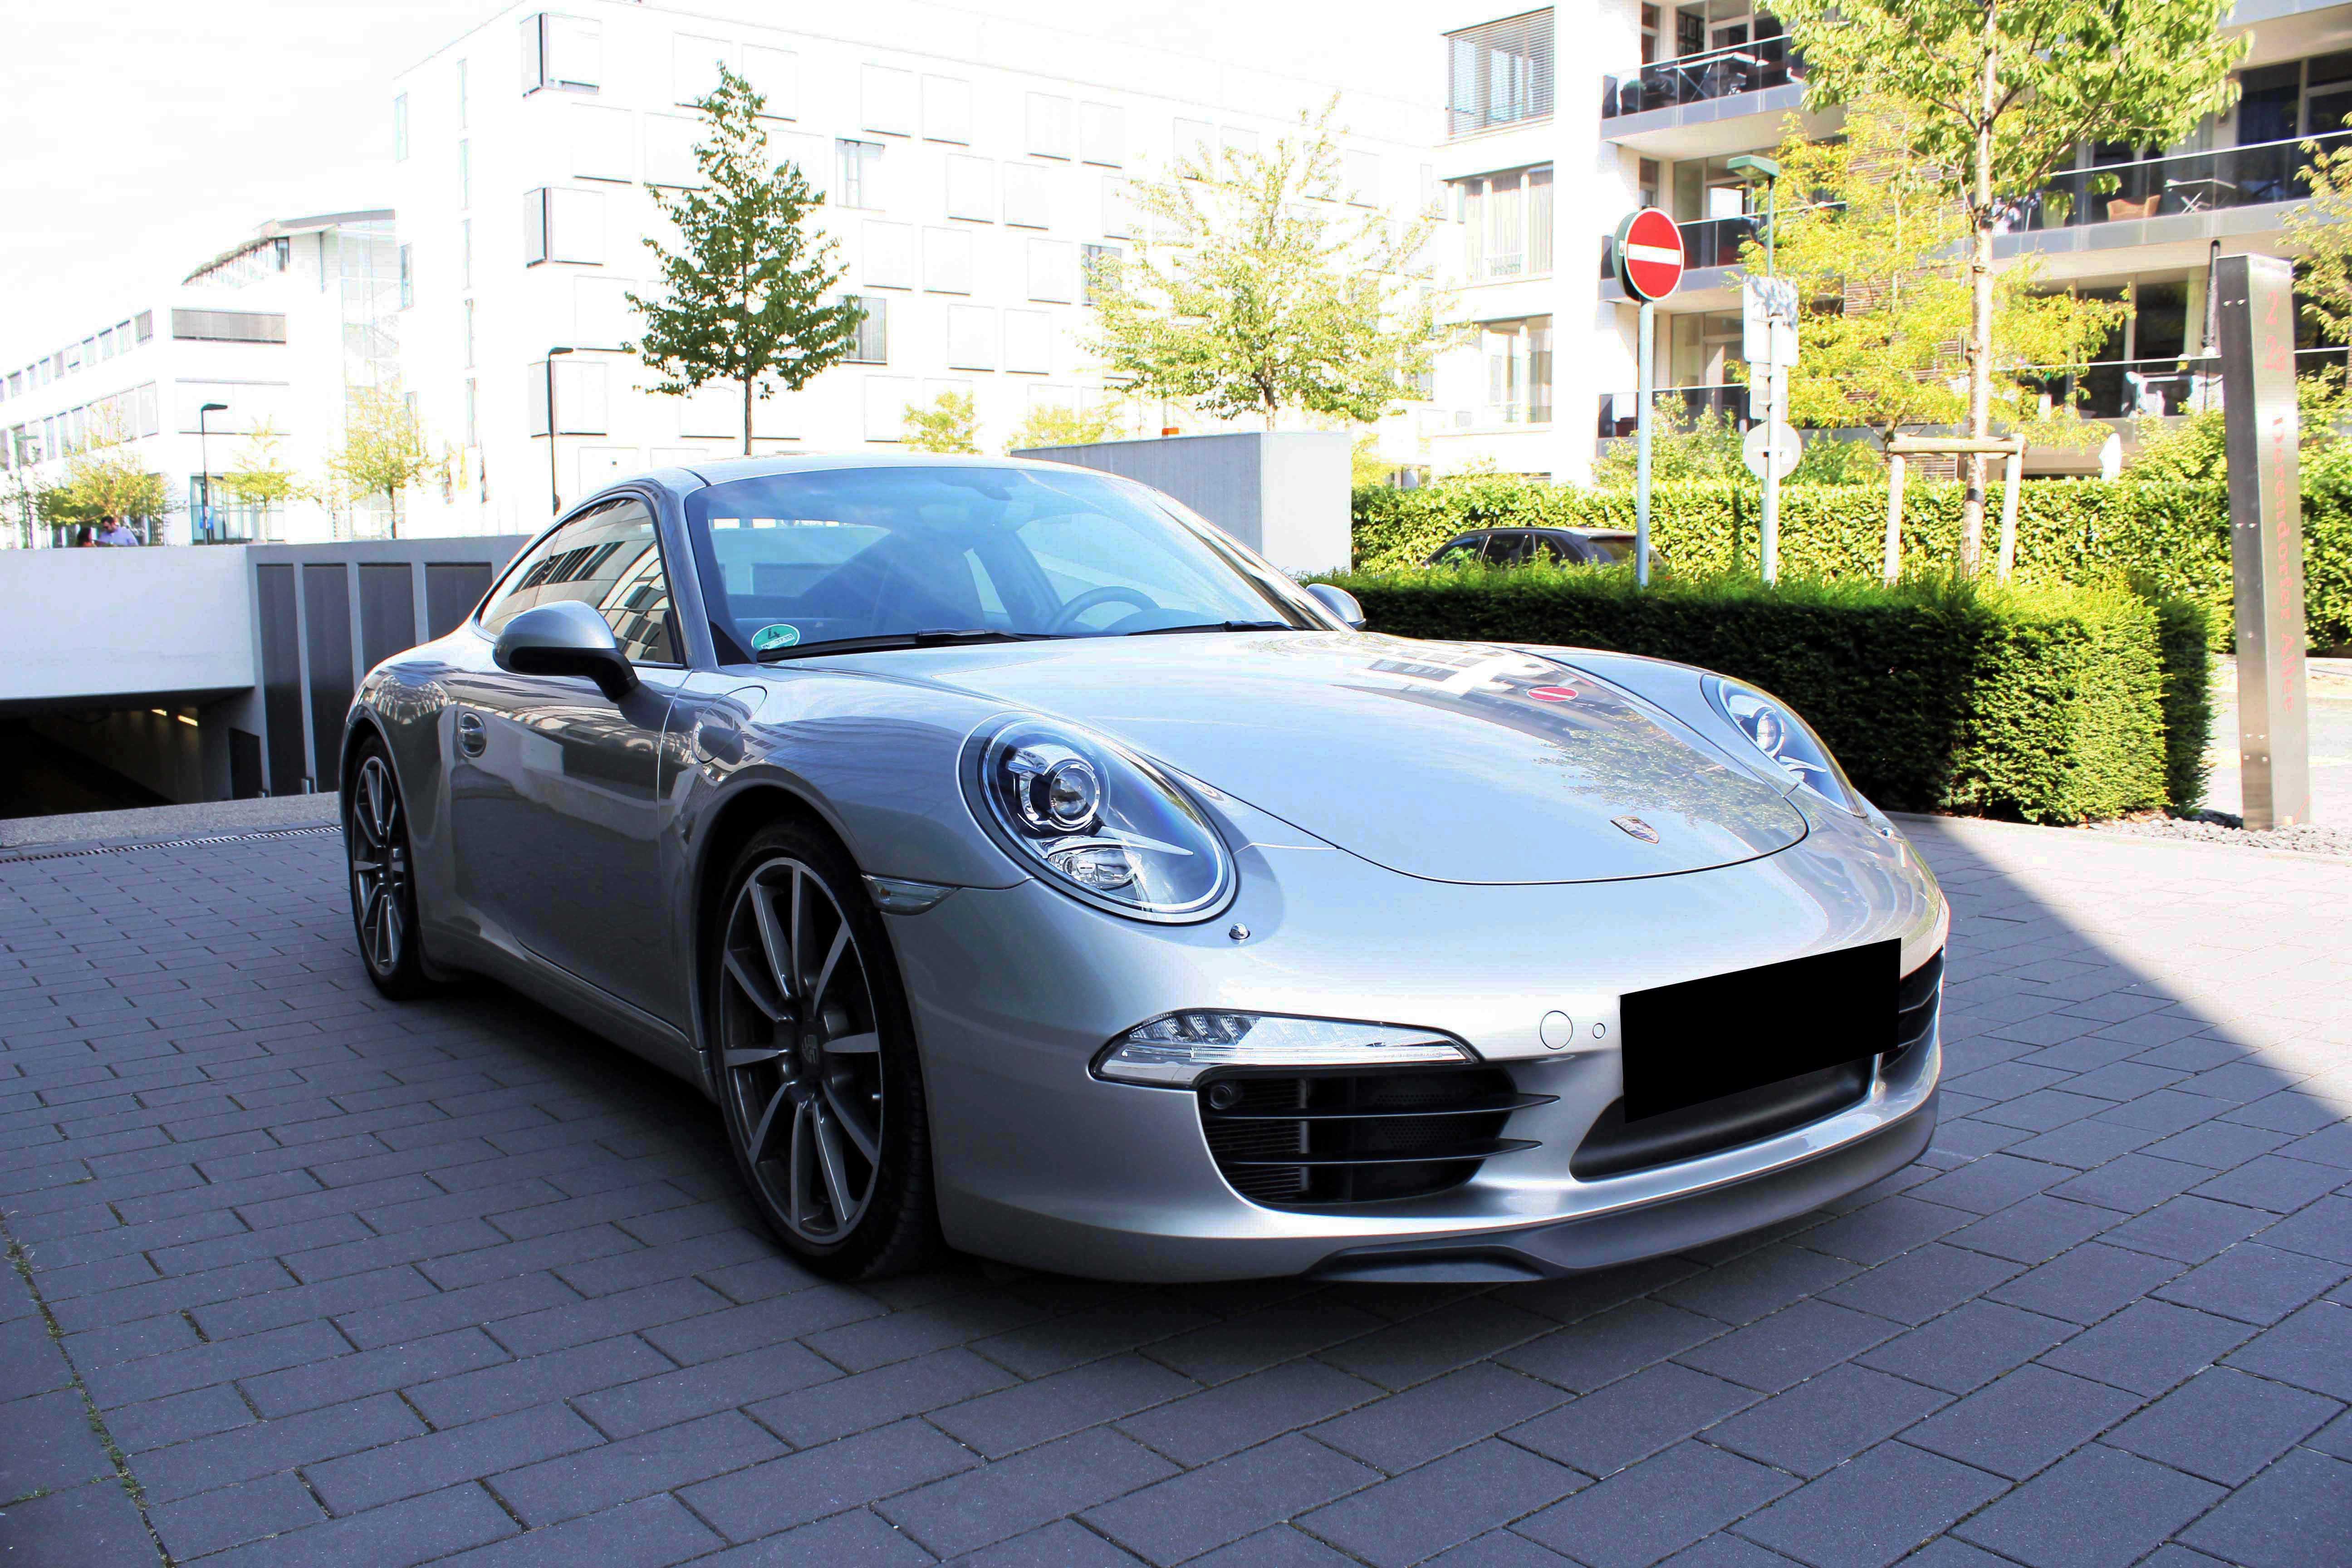 Porsche_911_991_Carrera_S_Ankauf_Silber_PDK_Sportwagen